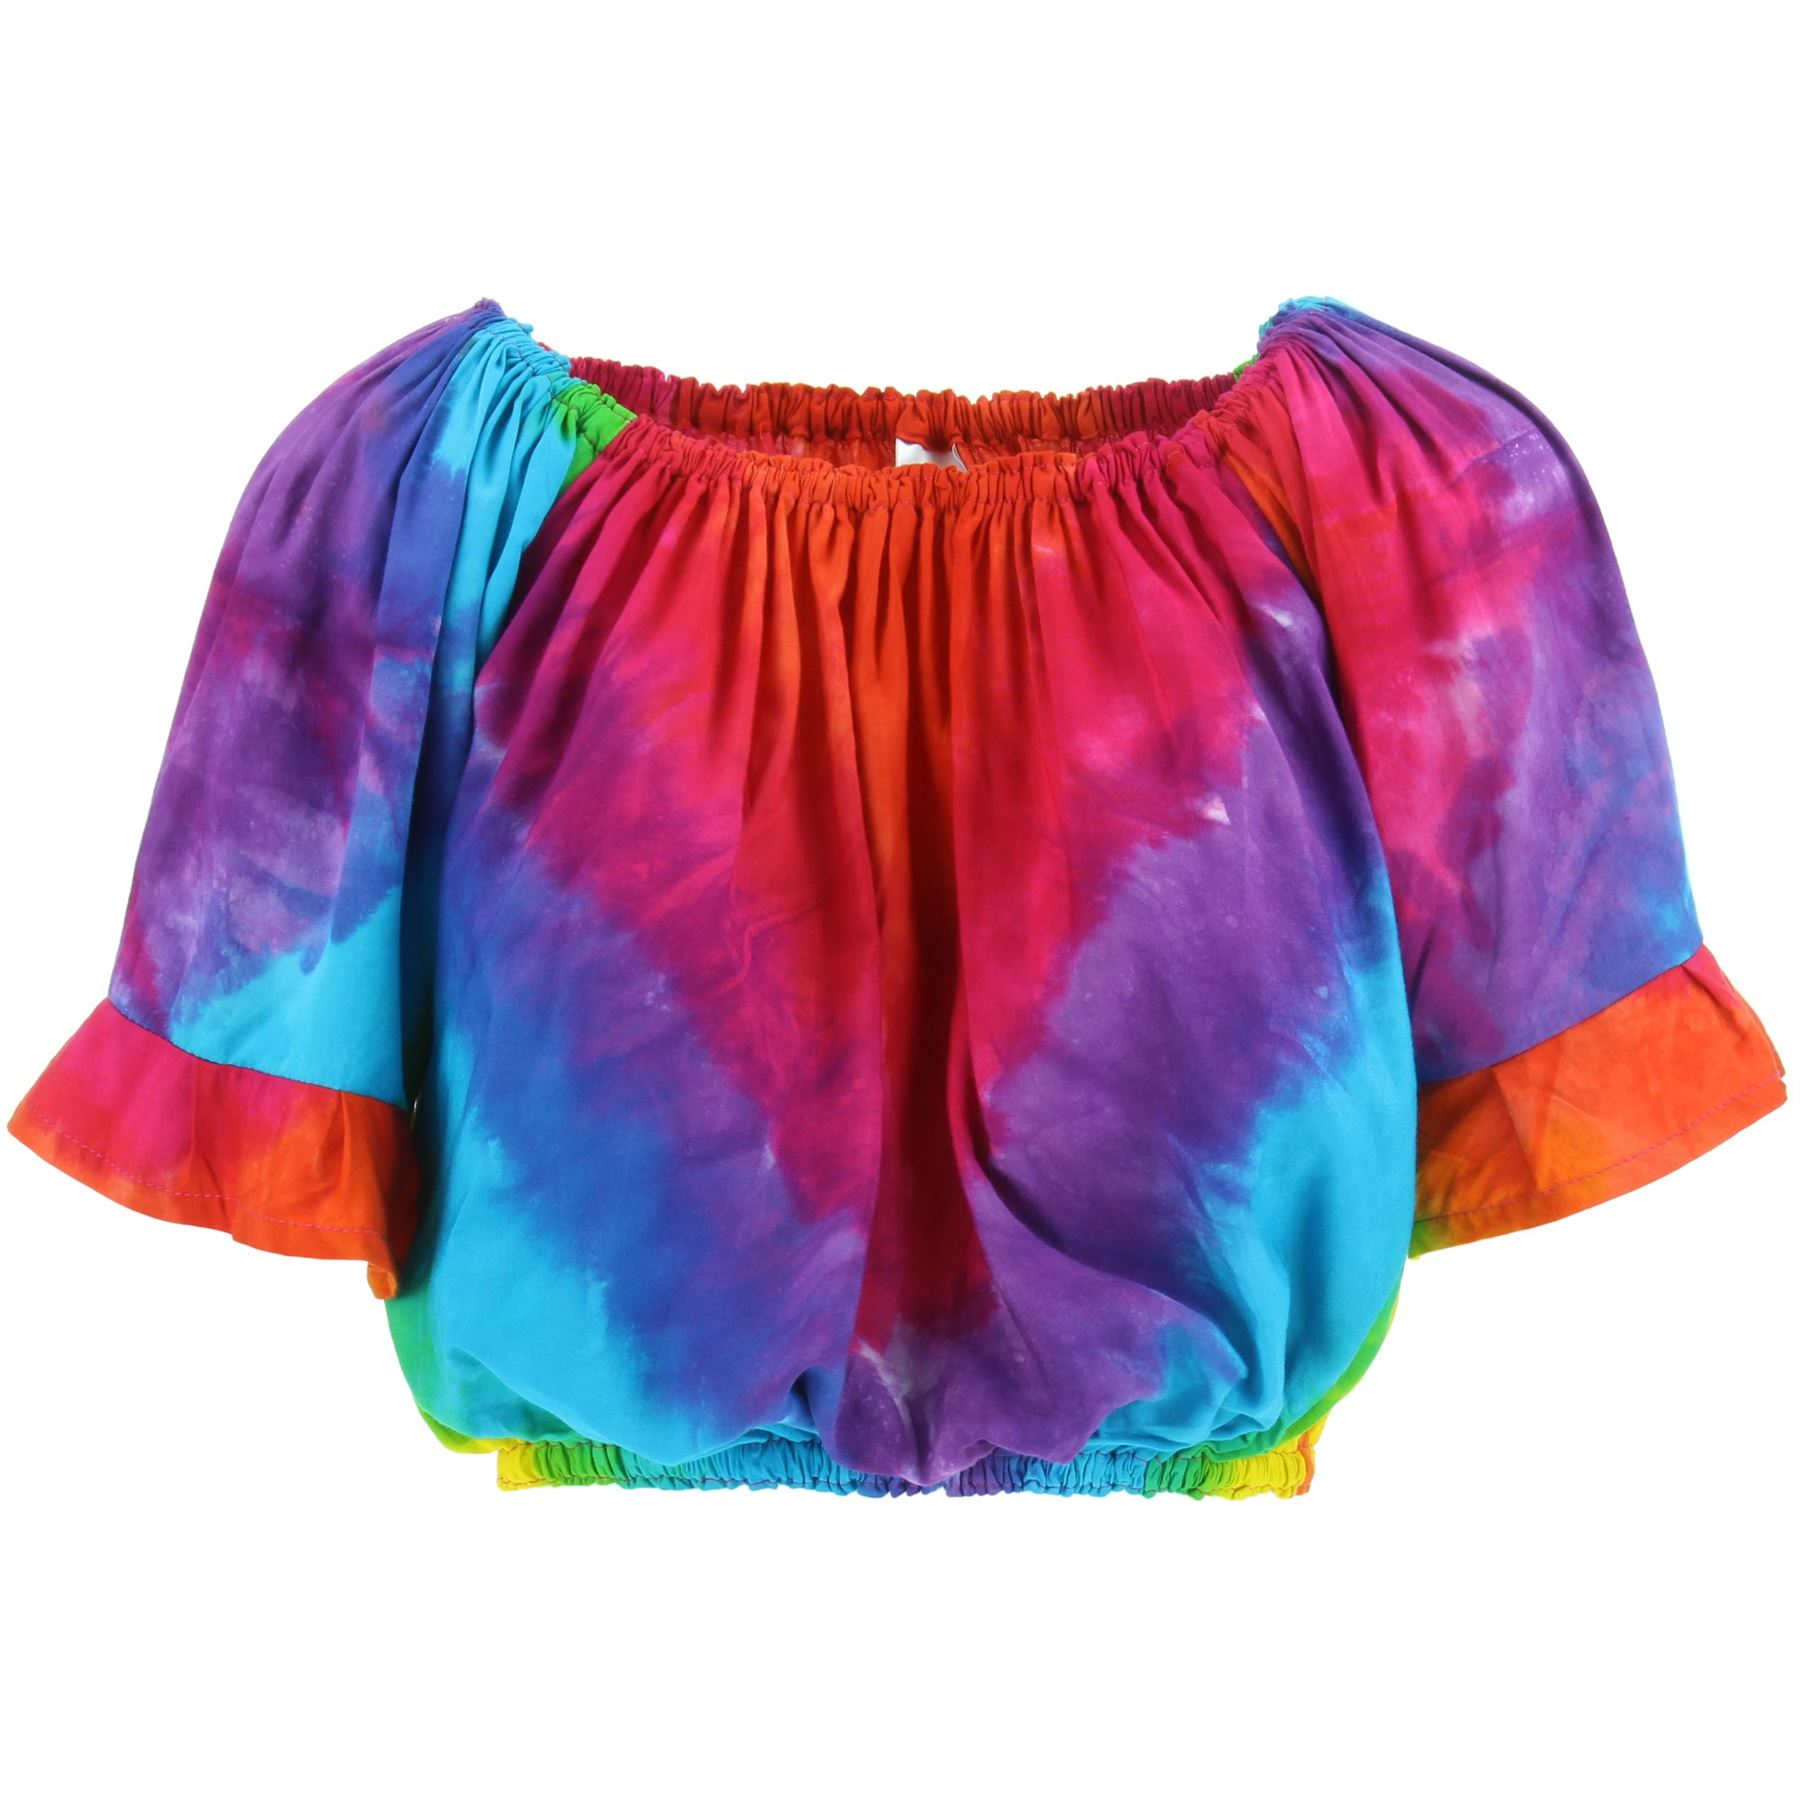 Bardot Off Shoulder Top Frill Summer Tie Dye Rainbow Ladies Sleeveless